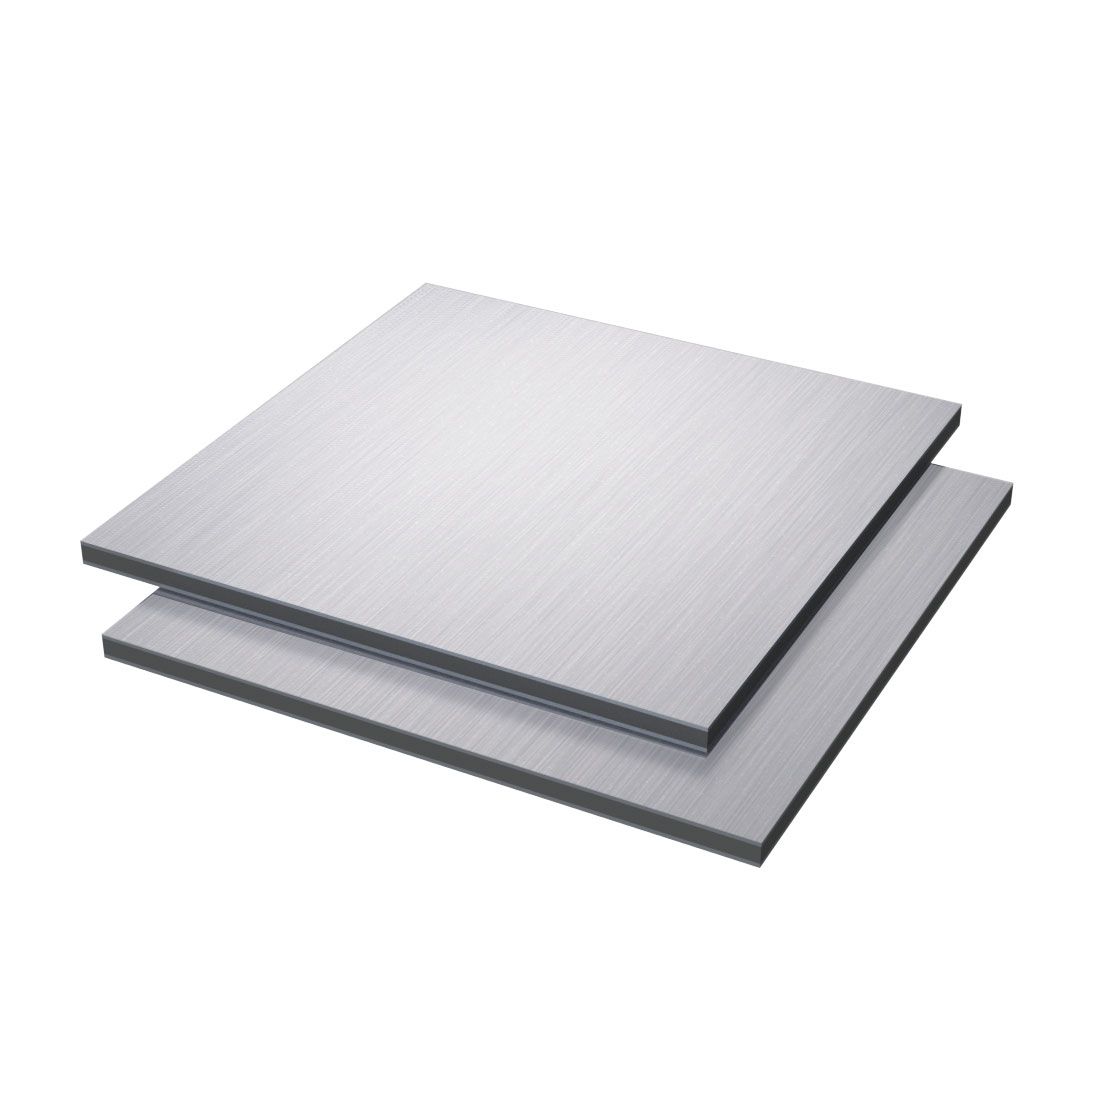 Vibond Aluminium /PE Brushed Zilver Bbl8001/bb6001 3050x1500x3mm